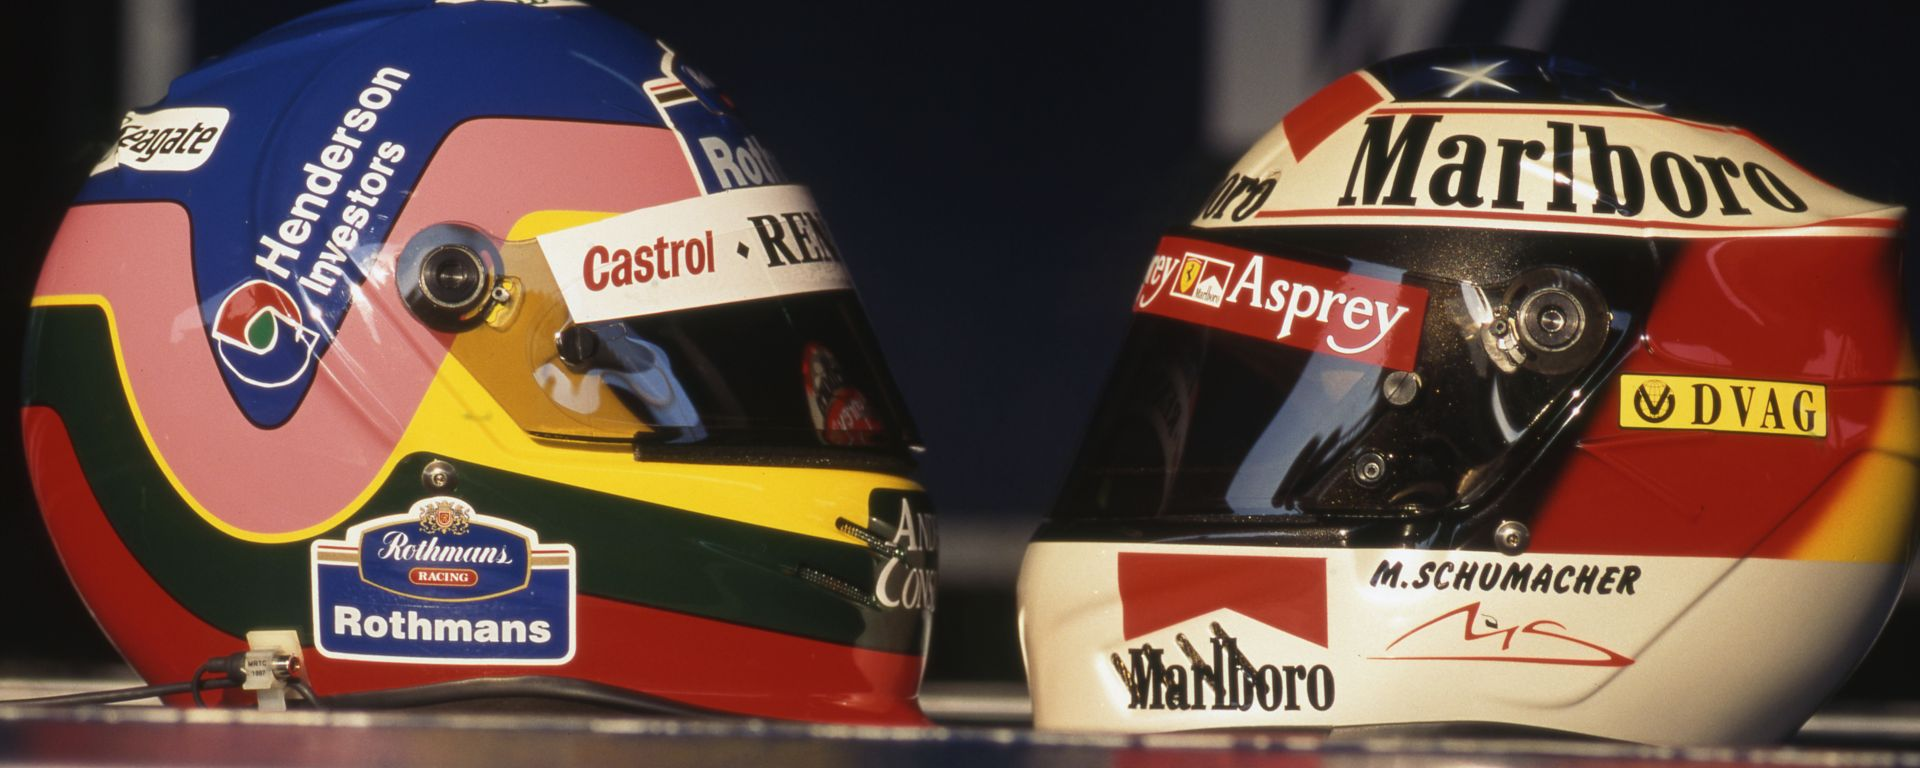 F1 1997: i caschi di Jacques Villeneuve e Michael Schumacher